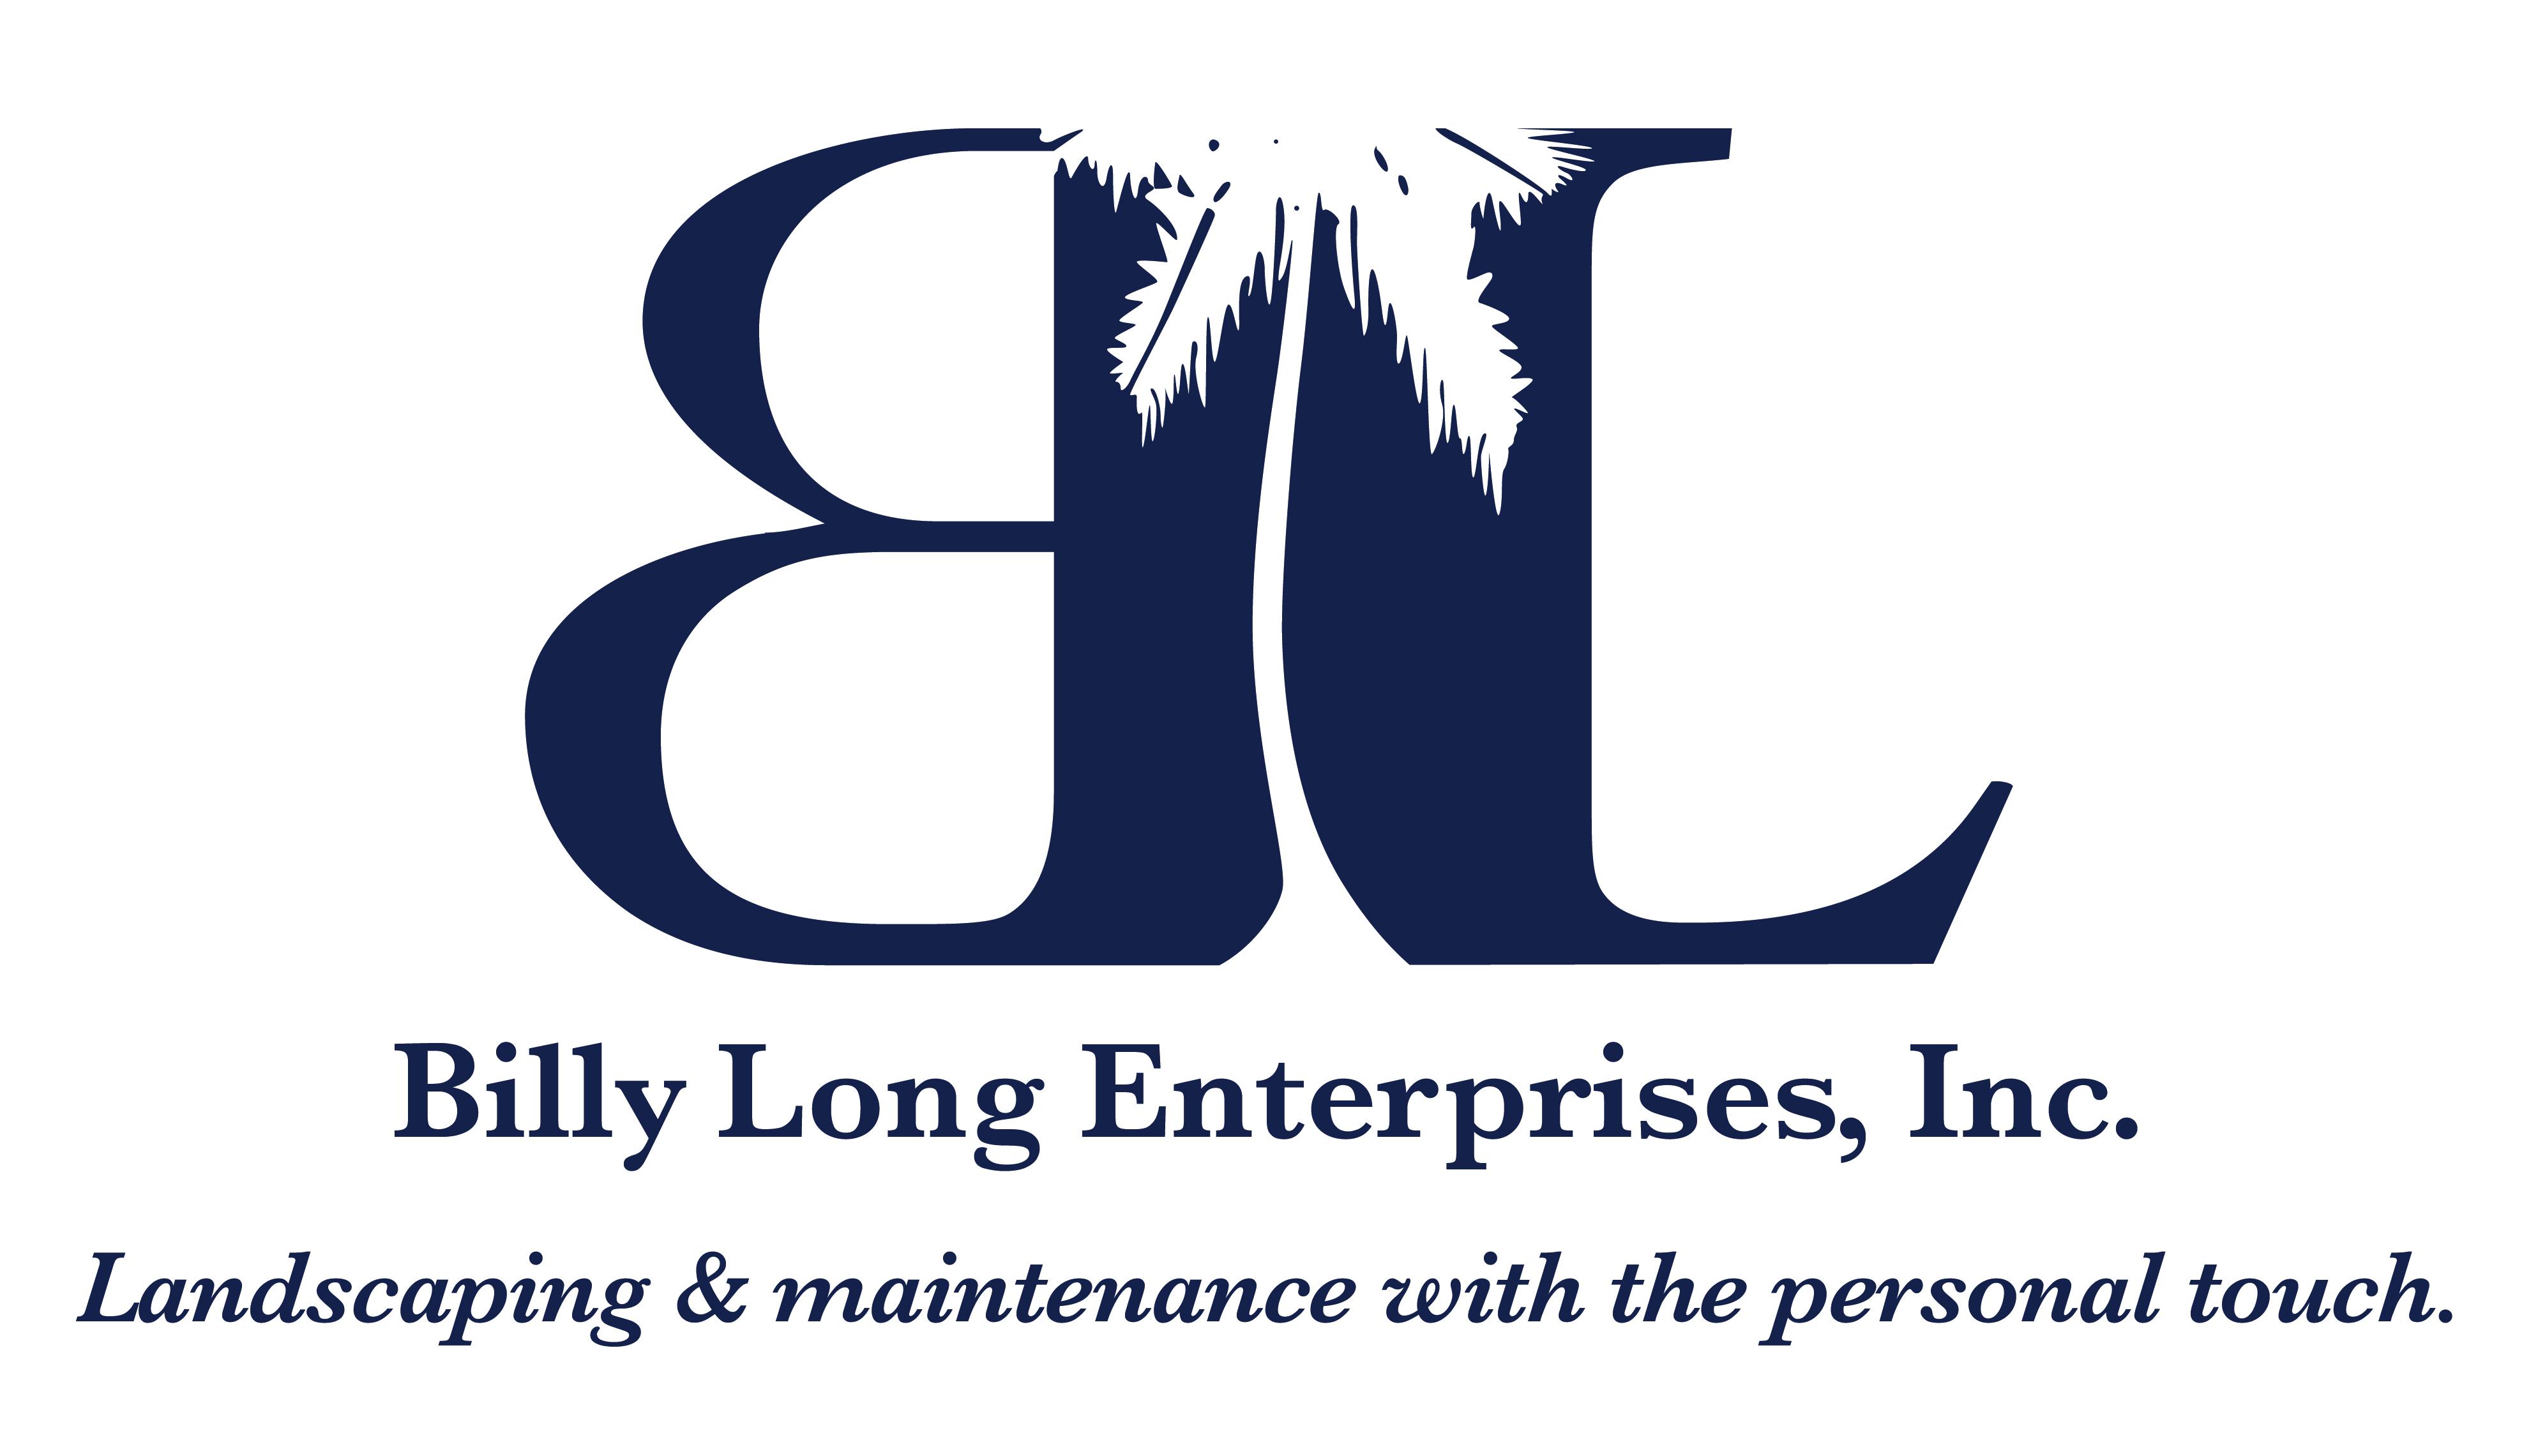 Billy Long Enterprises, Inc.